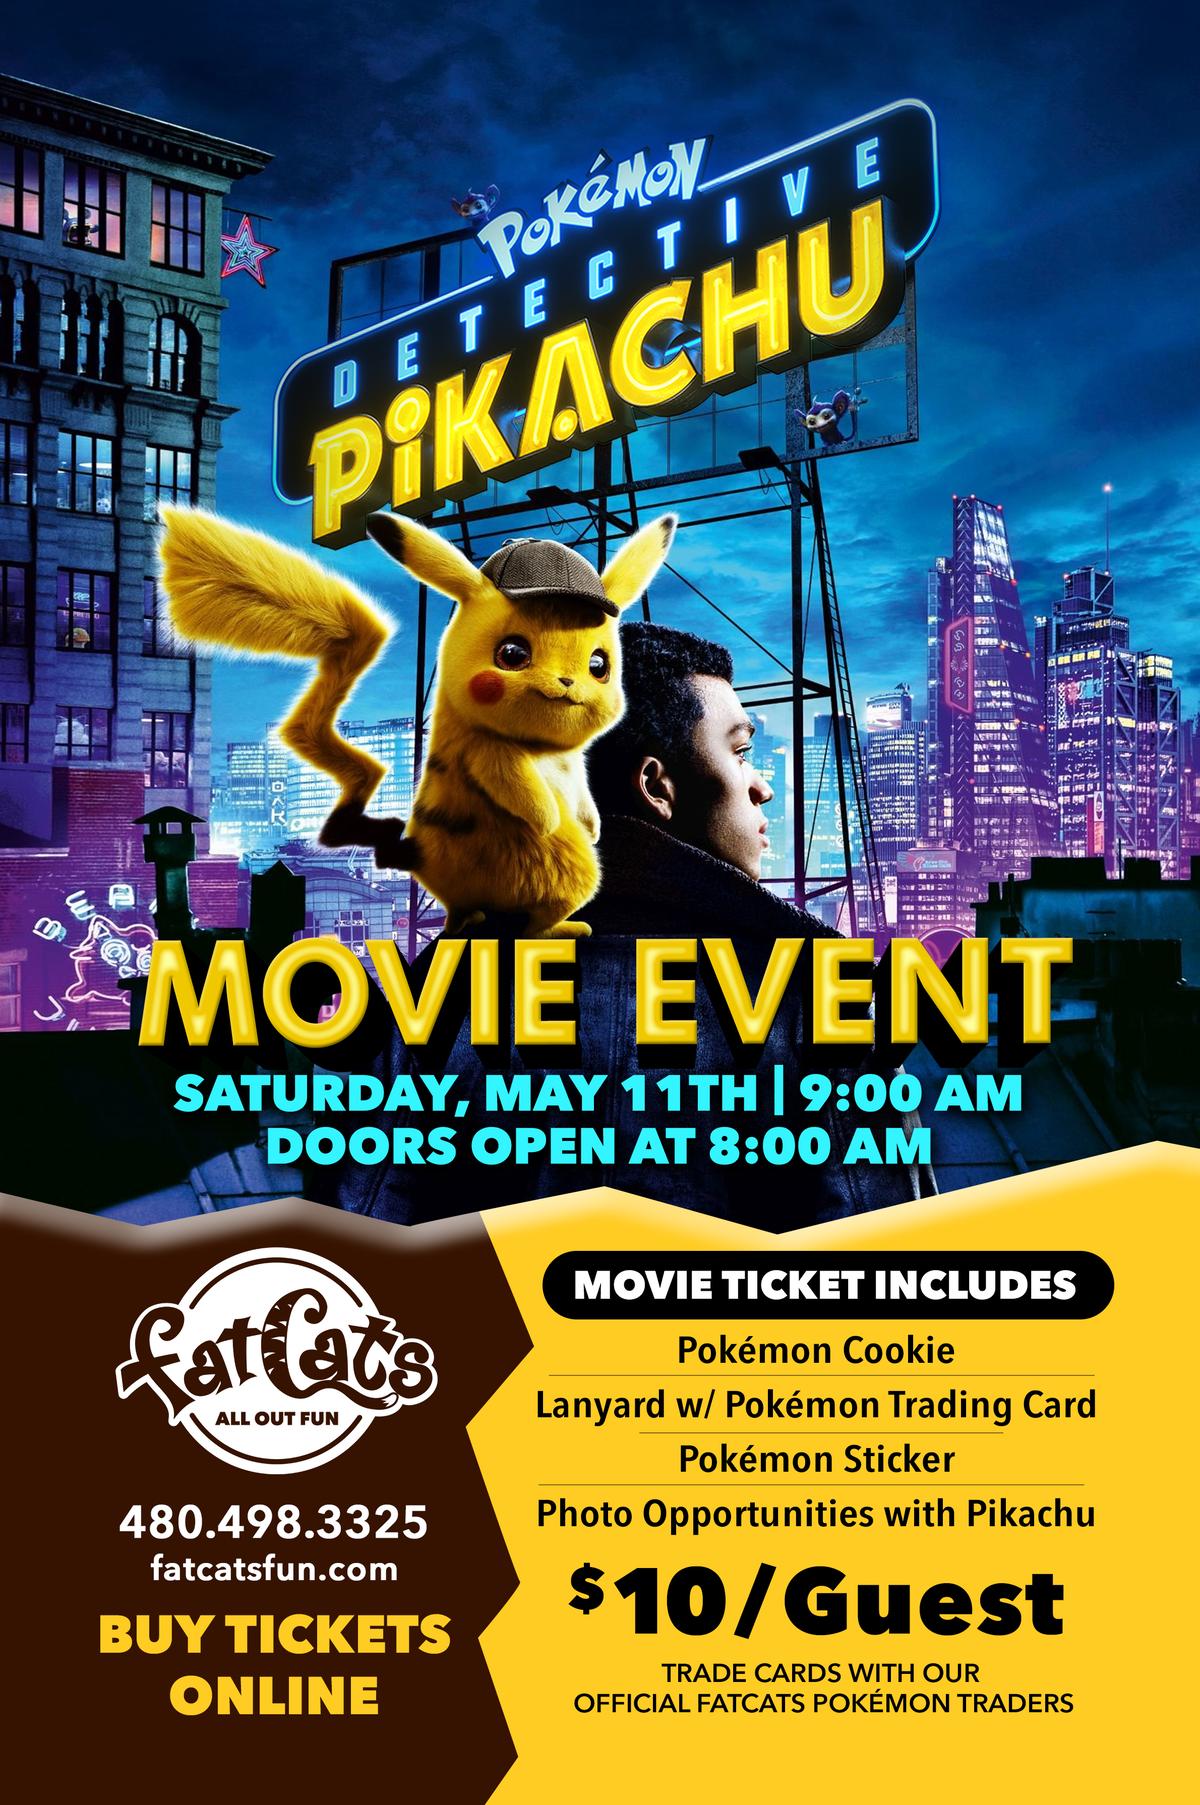 Pokemon: Detective Pikachu Movie Event Poster